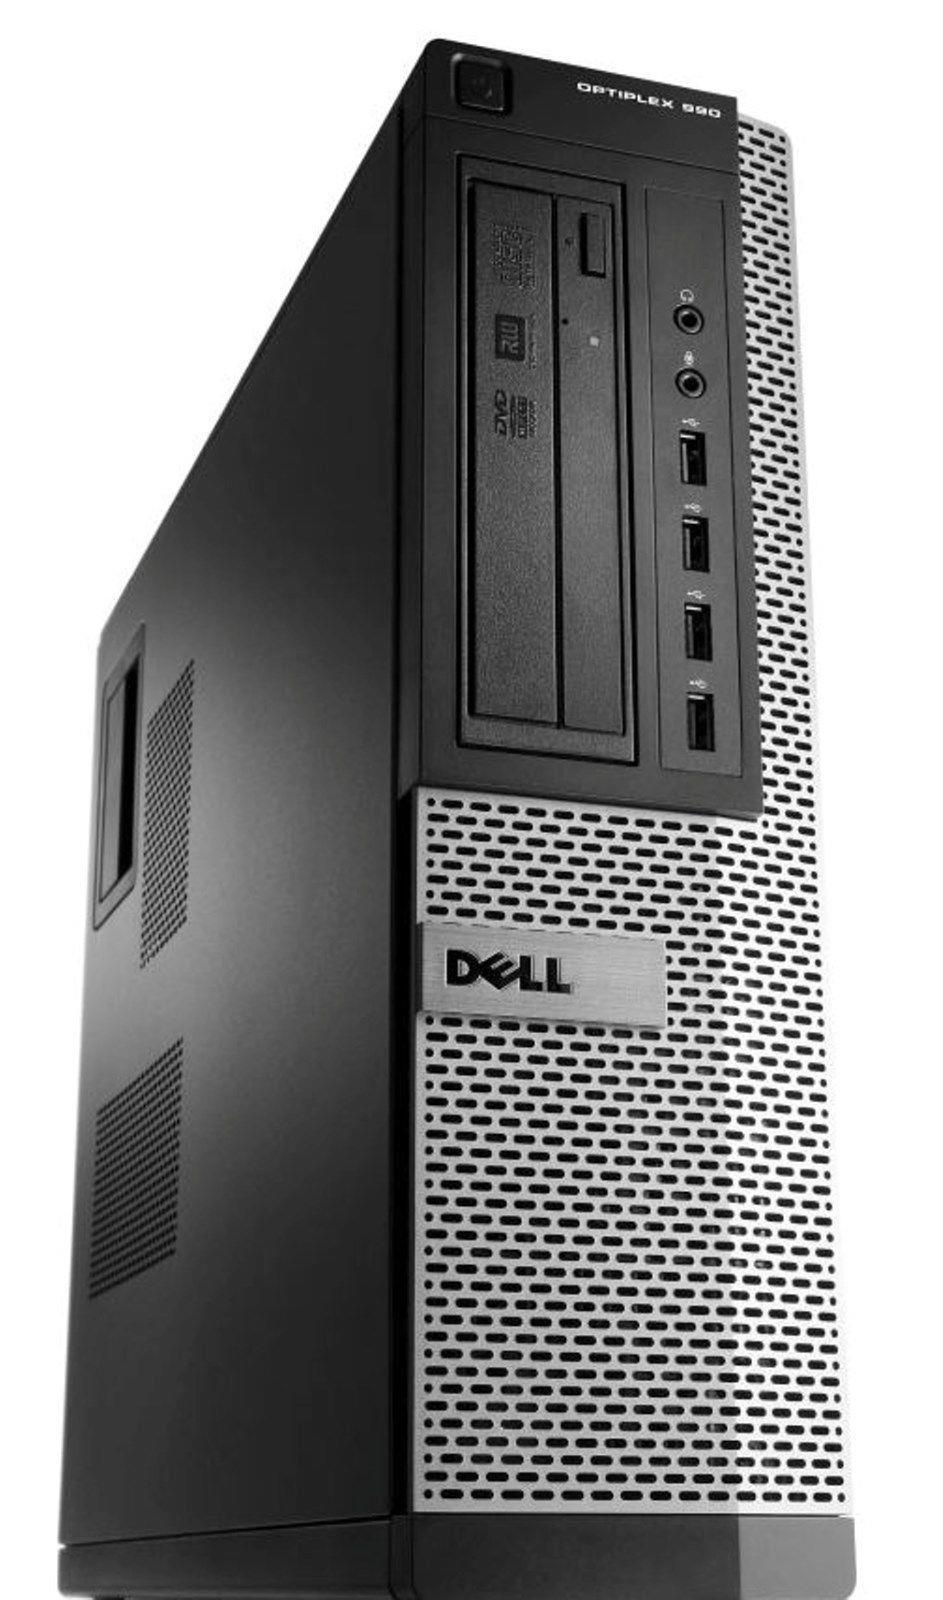 Calculator Dell OptiPlex 990 Desktop, Intel i7-2600 3.40GHz, 8GB DDR3, 500GB SATA, DVD-ROM